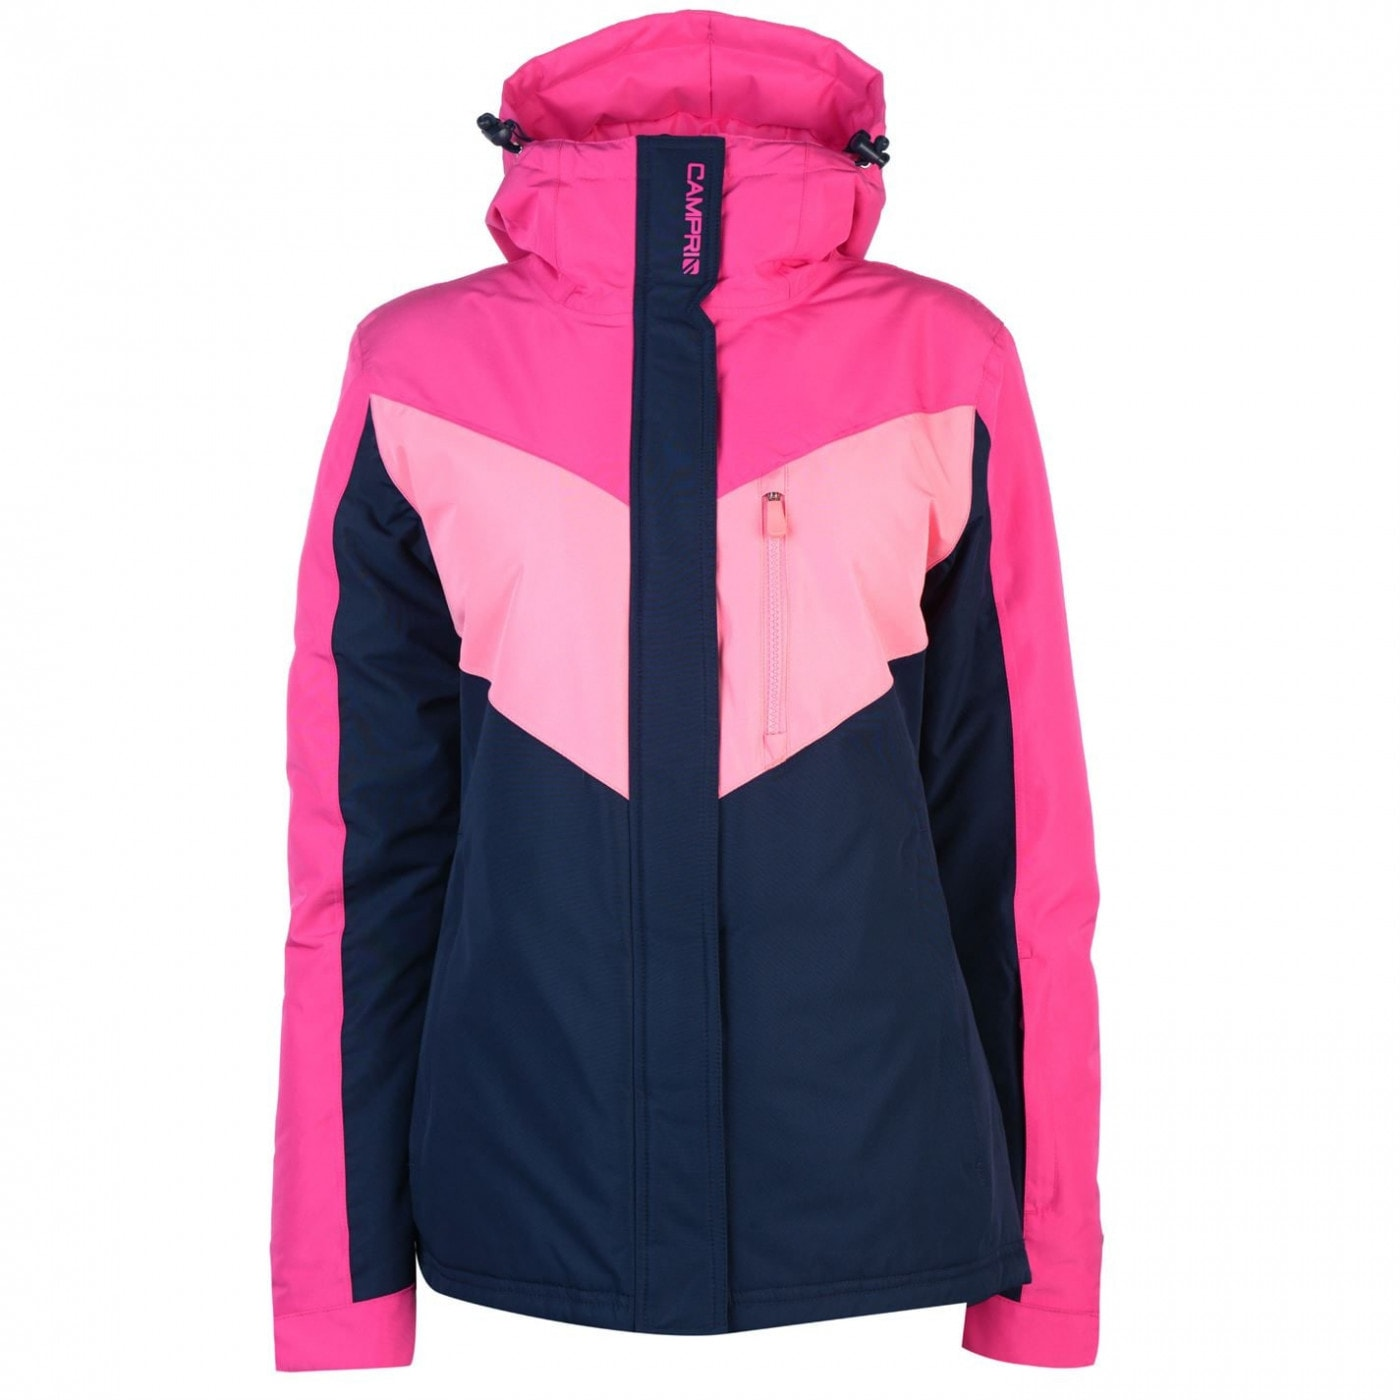 Women's jacket Campri Ski Jacket